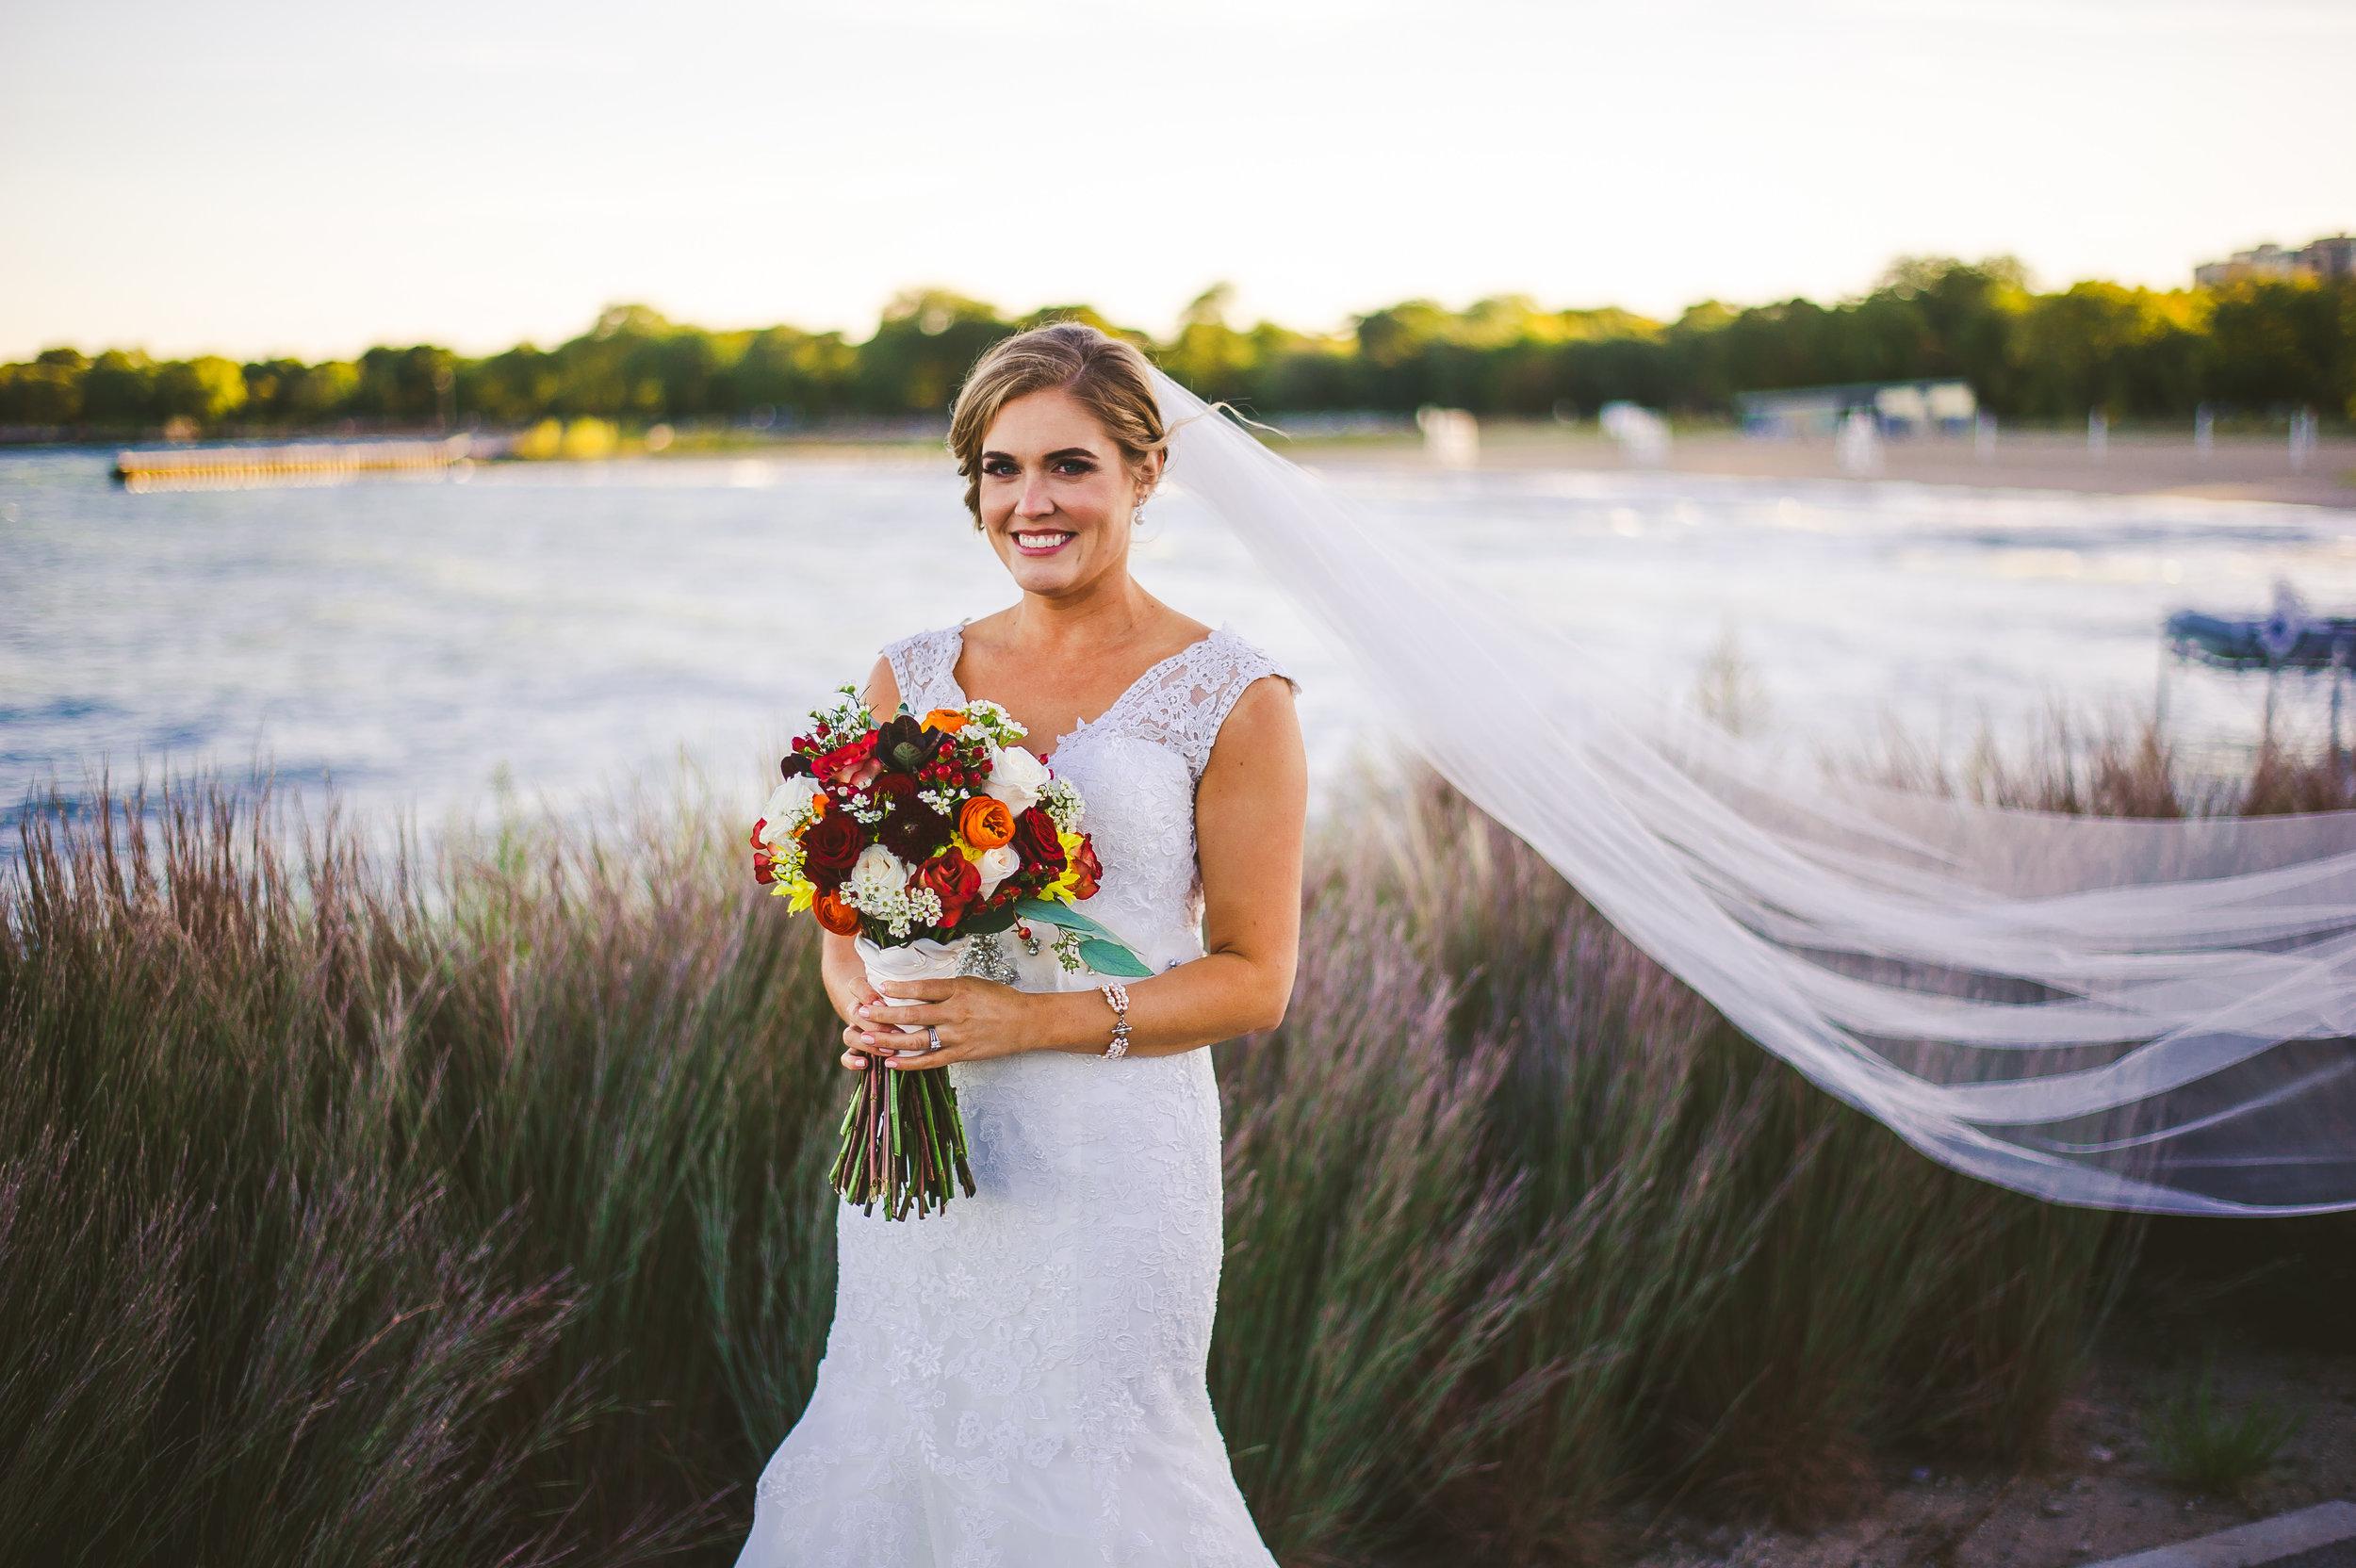 madison phil wedding_GXM_7516.jpg